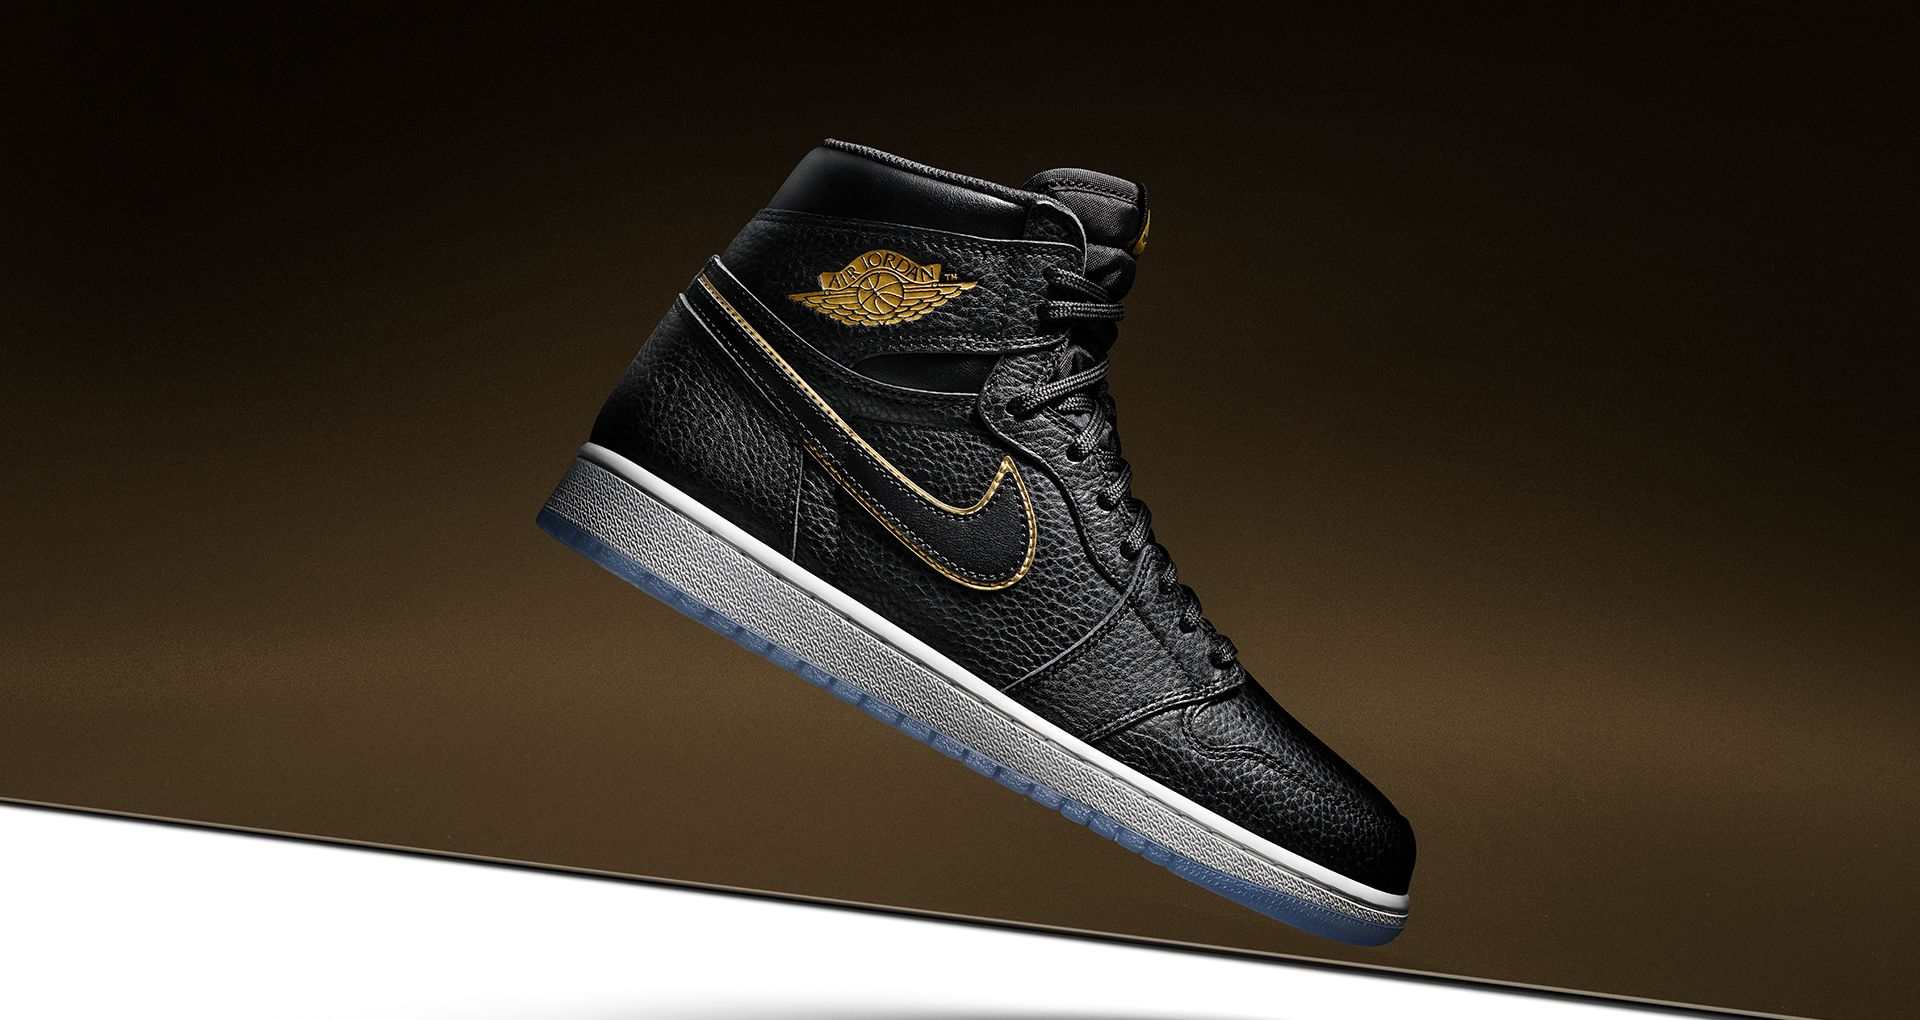 on sale 9b327 e96c3 Air Jordan 1 High OG  Black   Summit White  Release Date. Nike+ SNKRS